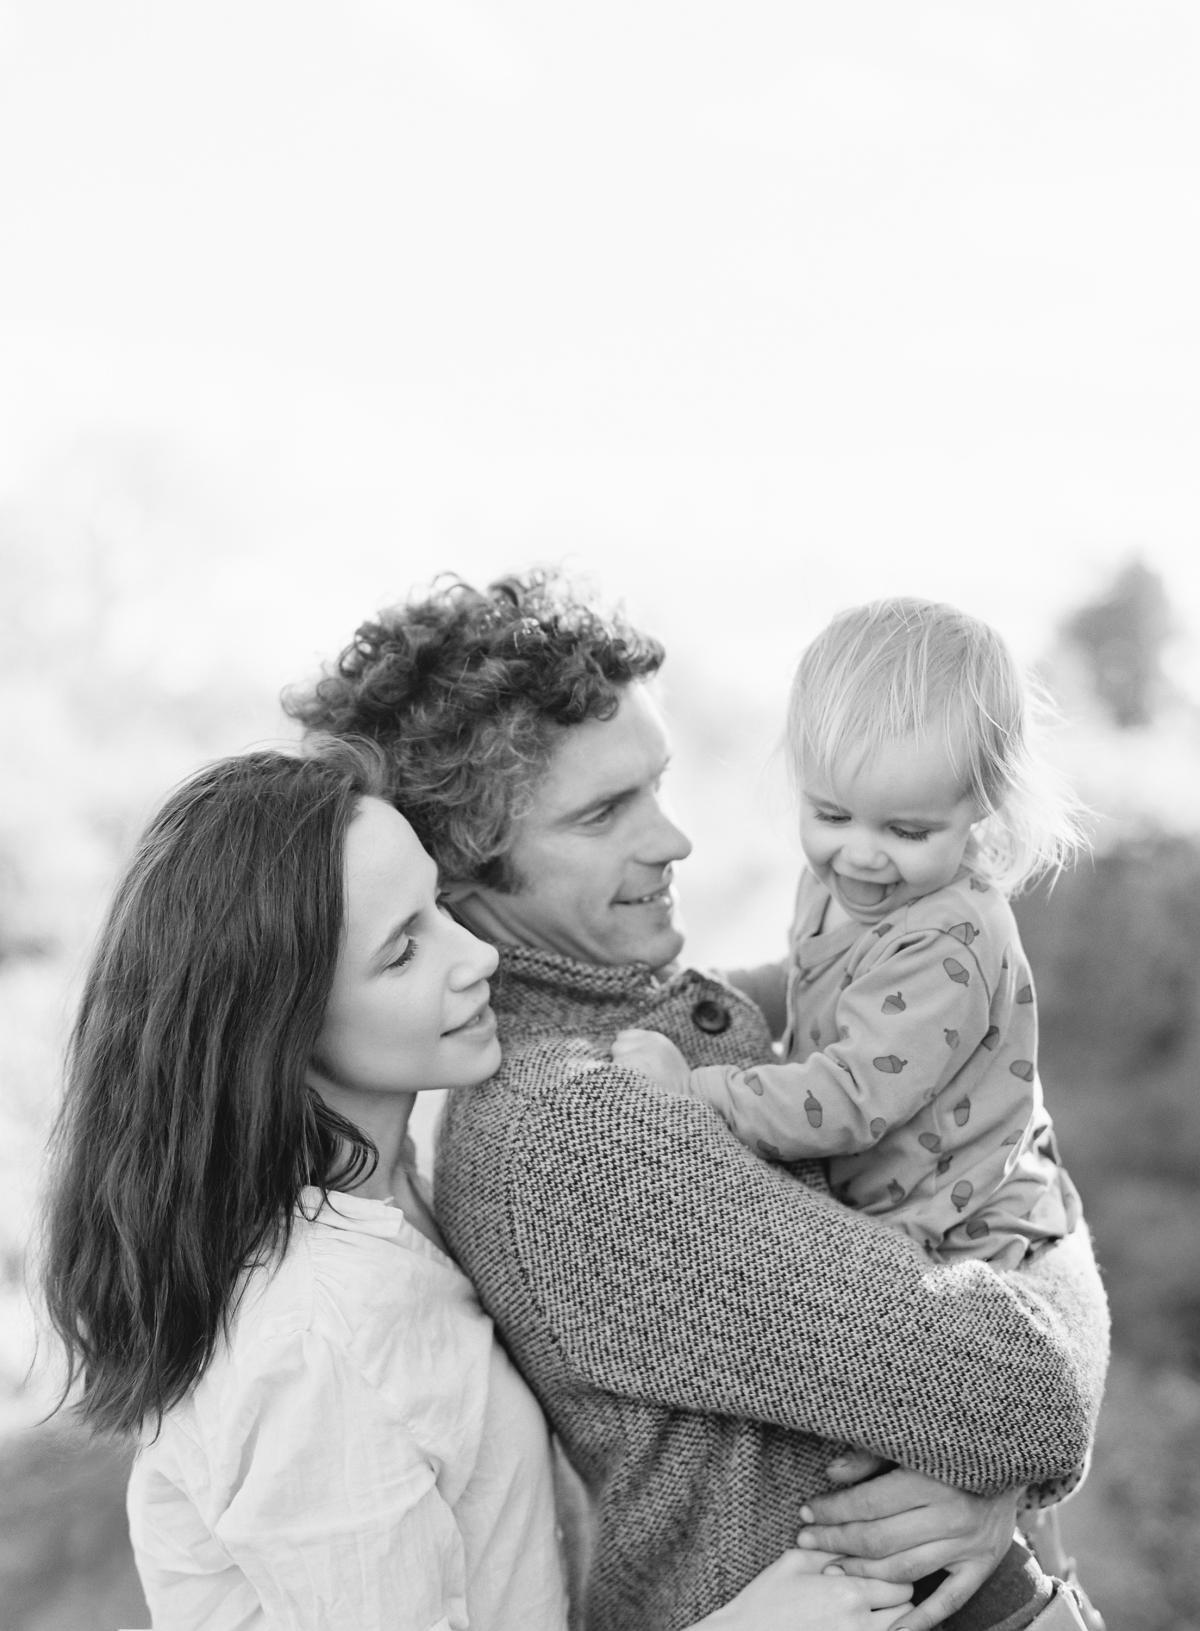 Pearl collins godiva cork ireland family photos 0011